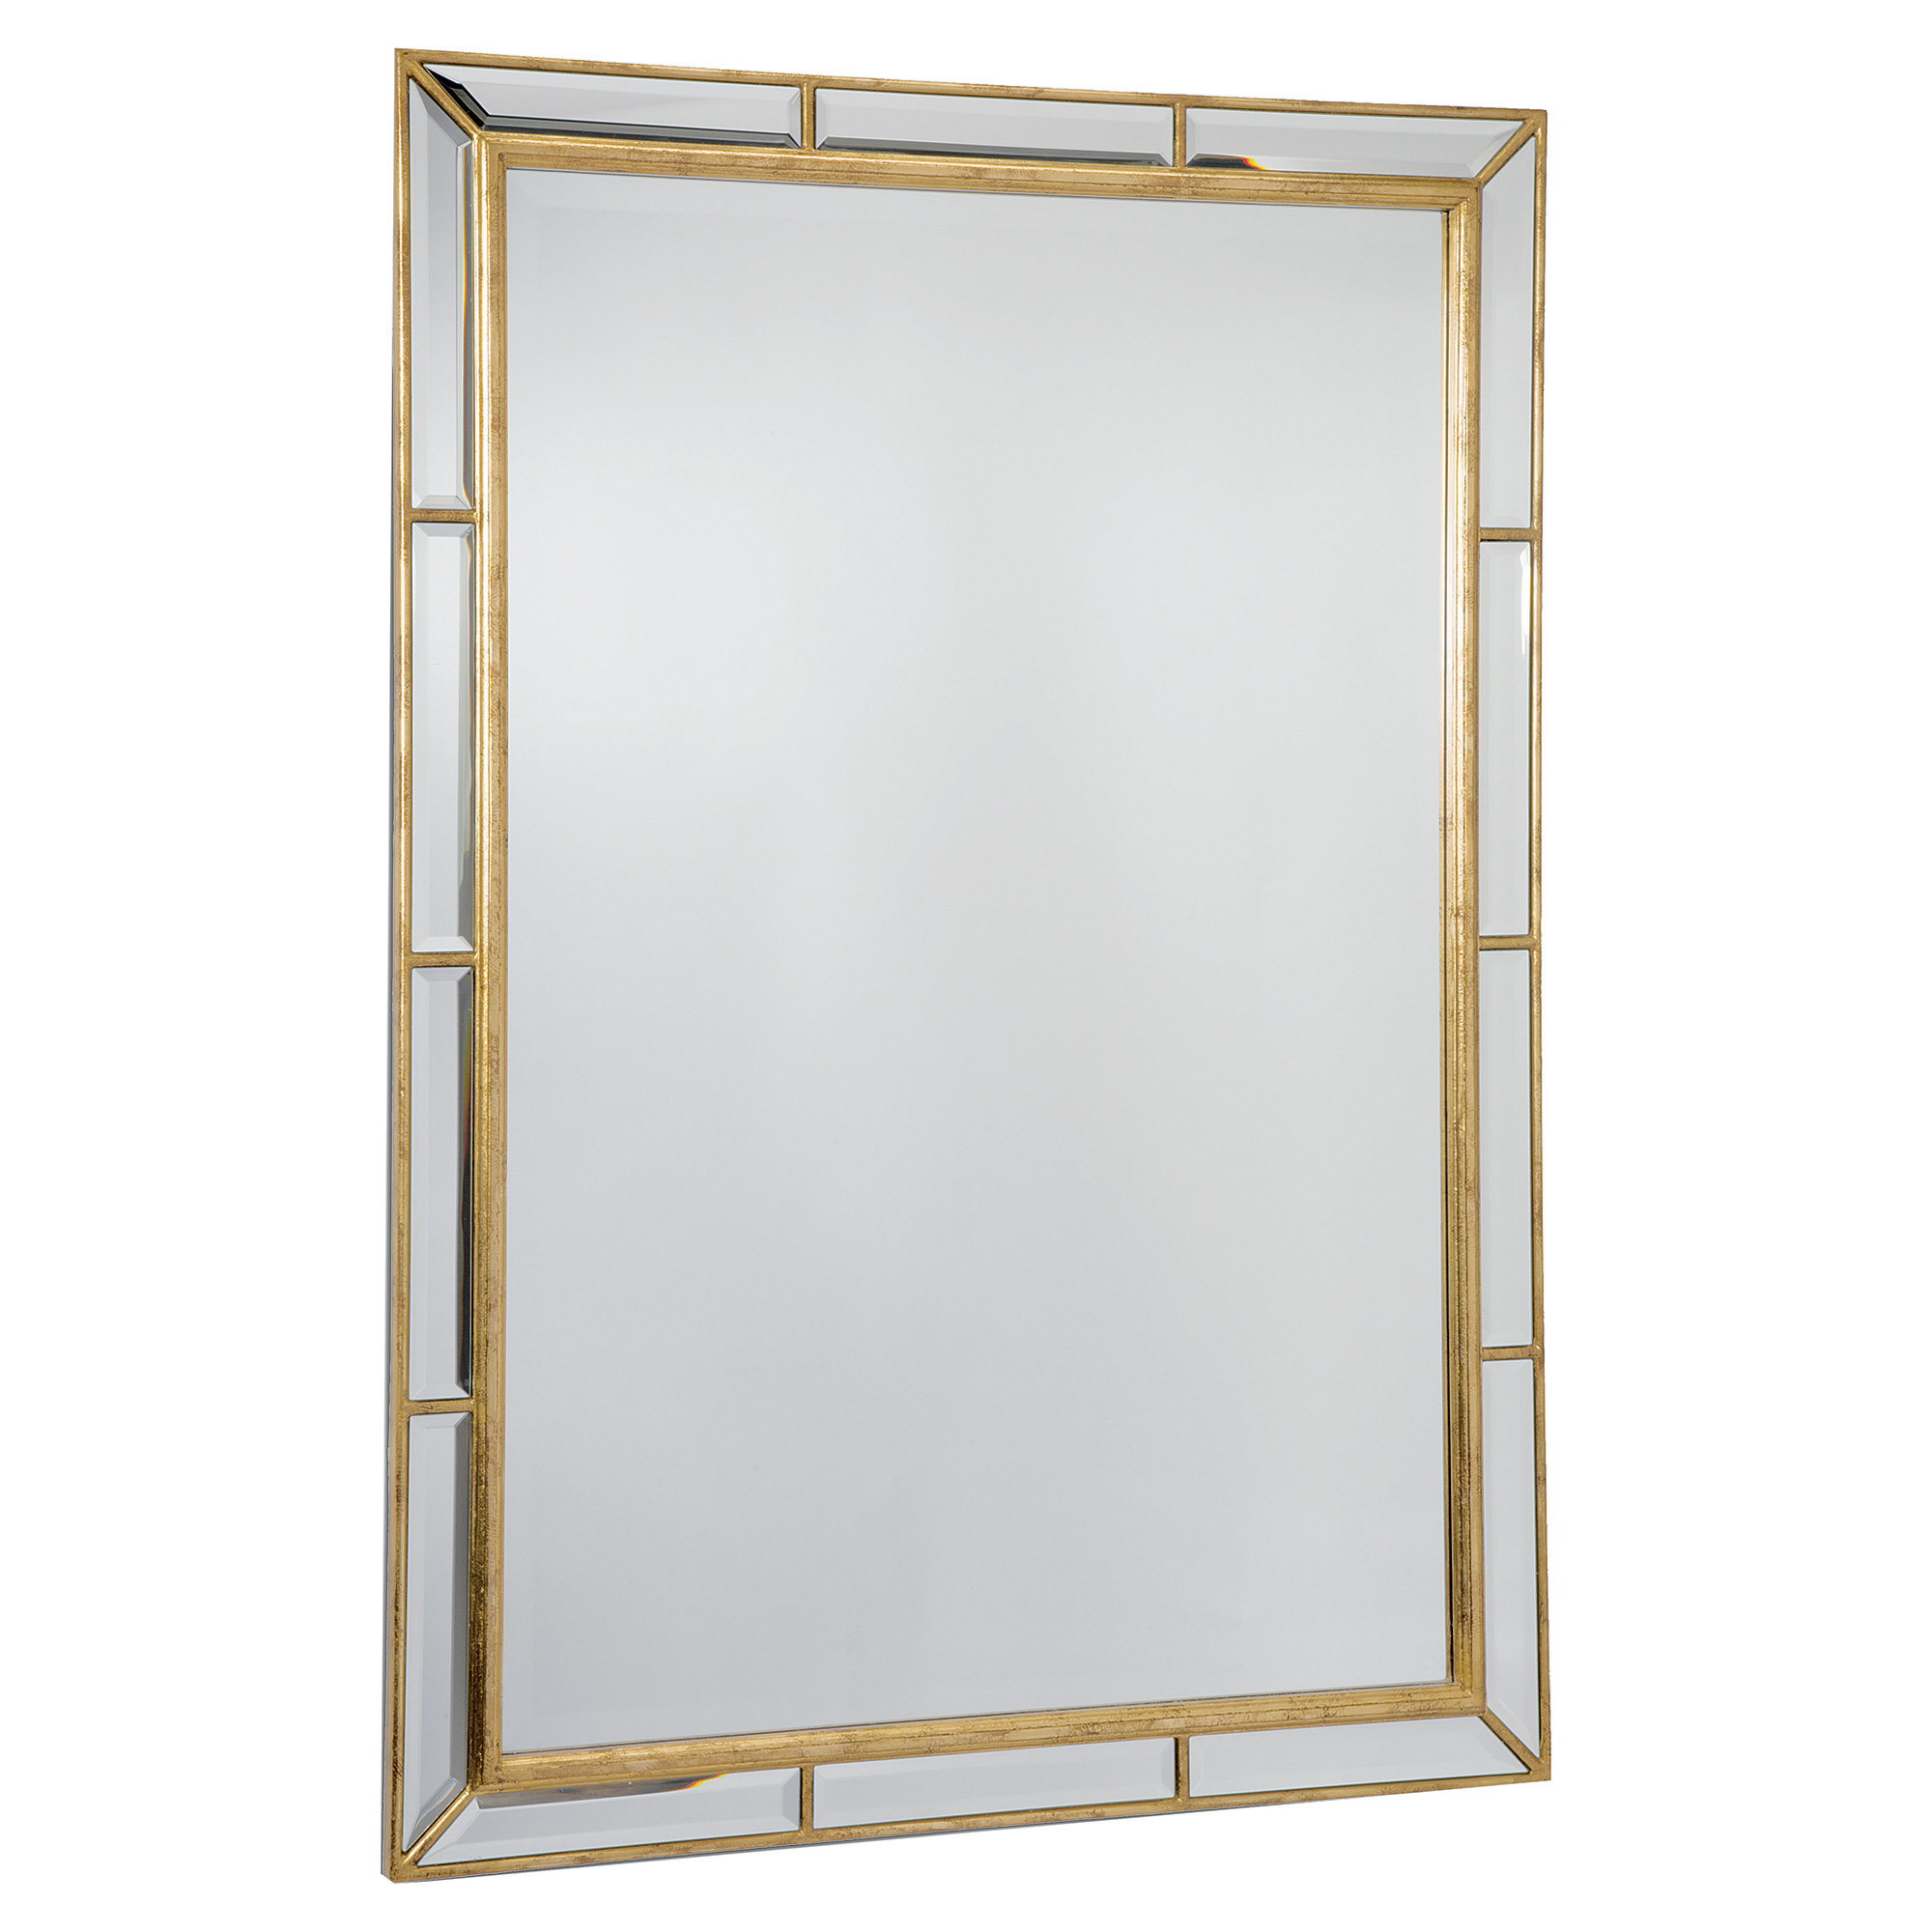 Taja Hollywood Antique Gold Beveled Rectangle Mirror